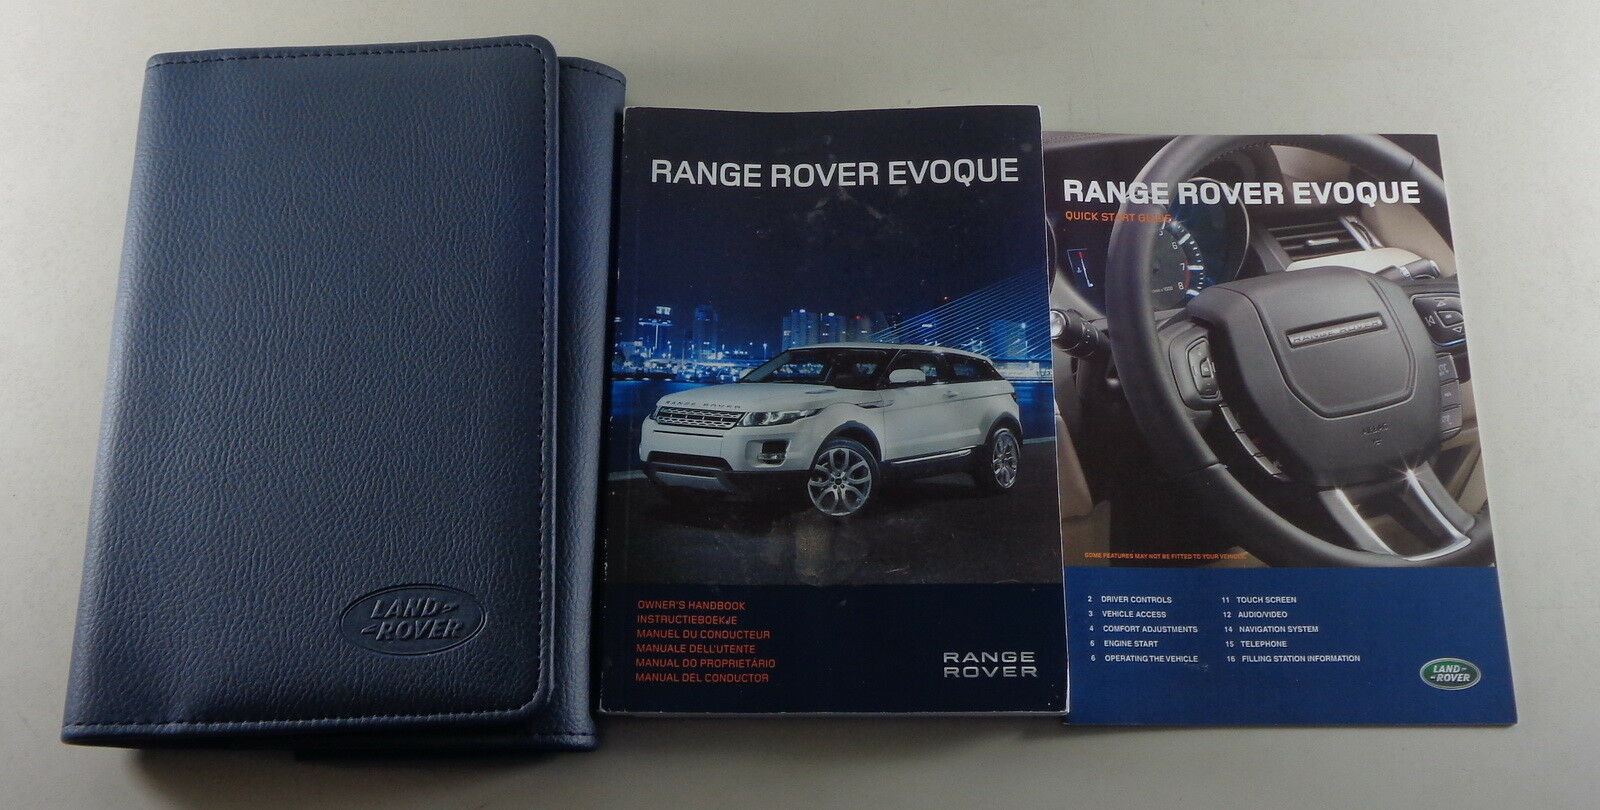 LAND ROVER RANGE ROVER I Proprietari Manuale /& manuali wallet NUOVO